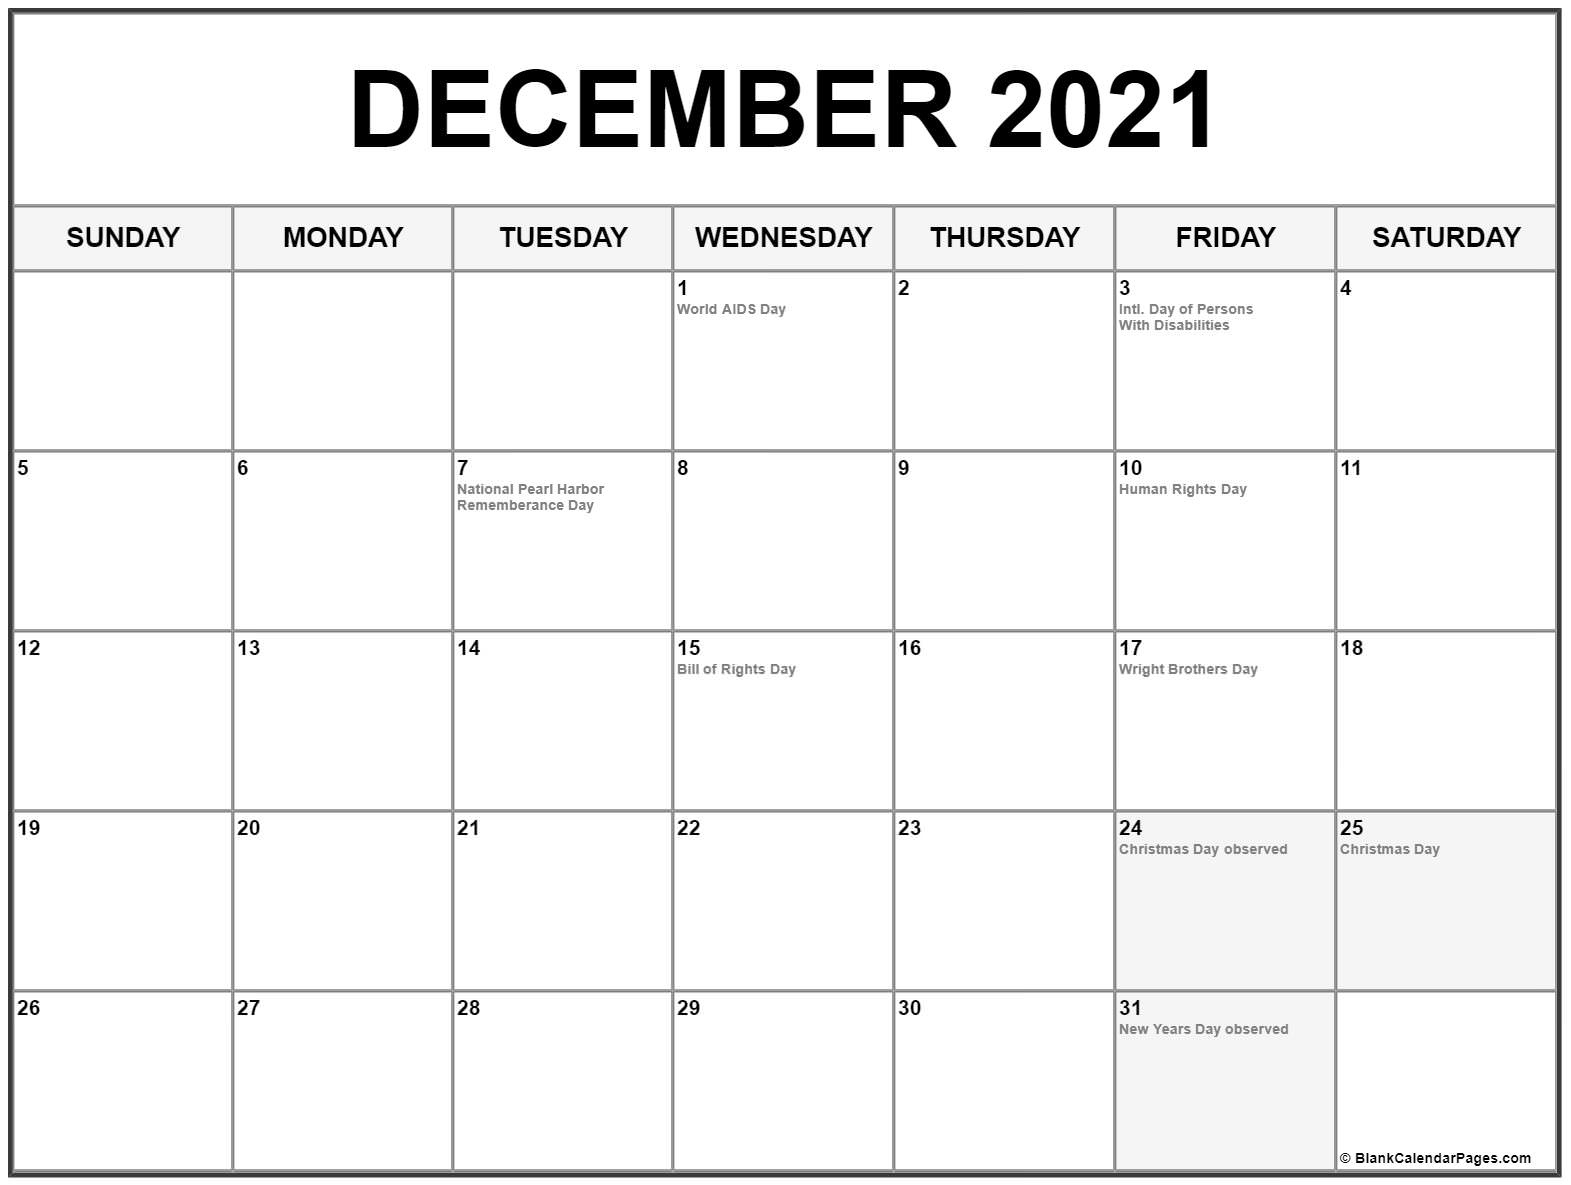 December 2021 Holiday Calendar   Printable March December 2020 January 2021 Calendar Australia